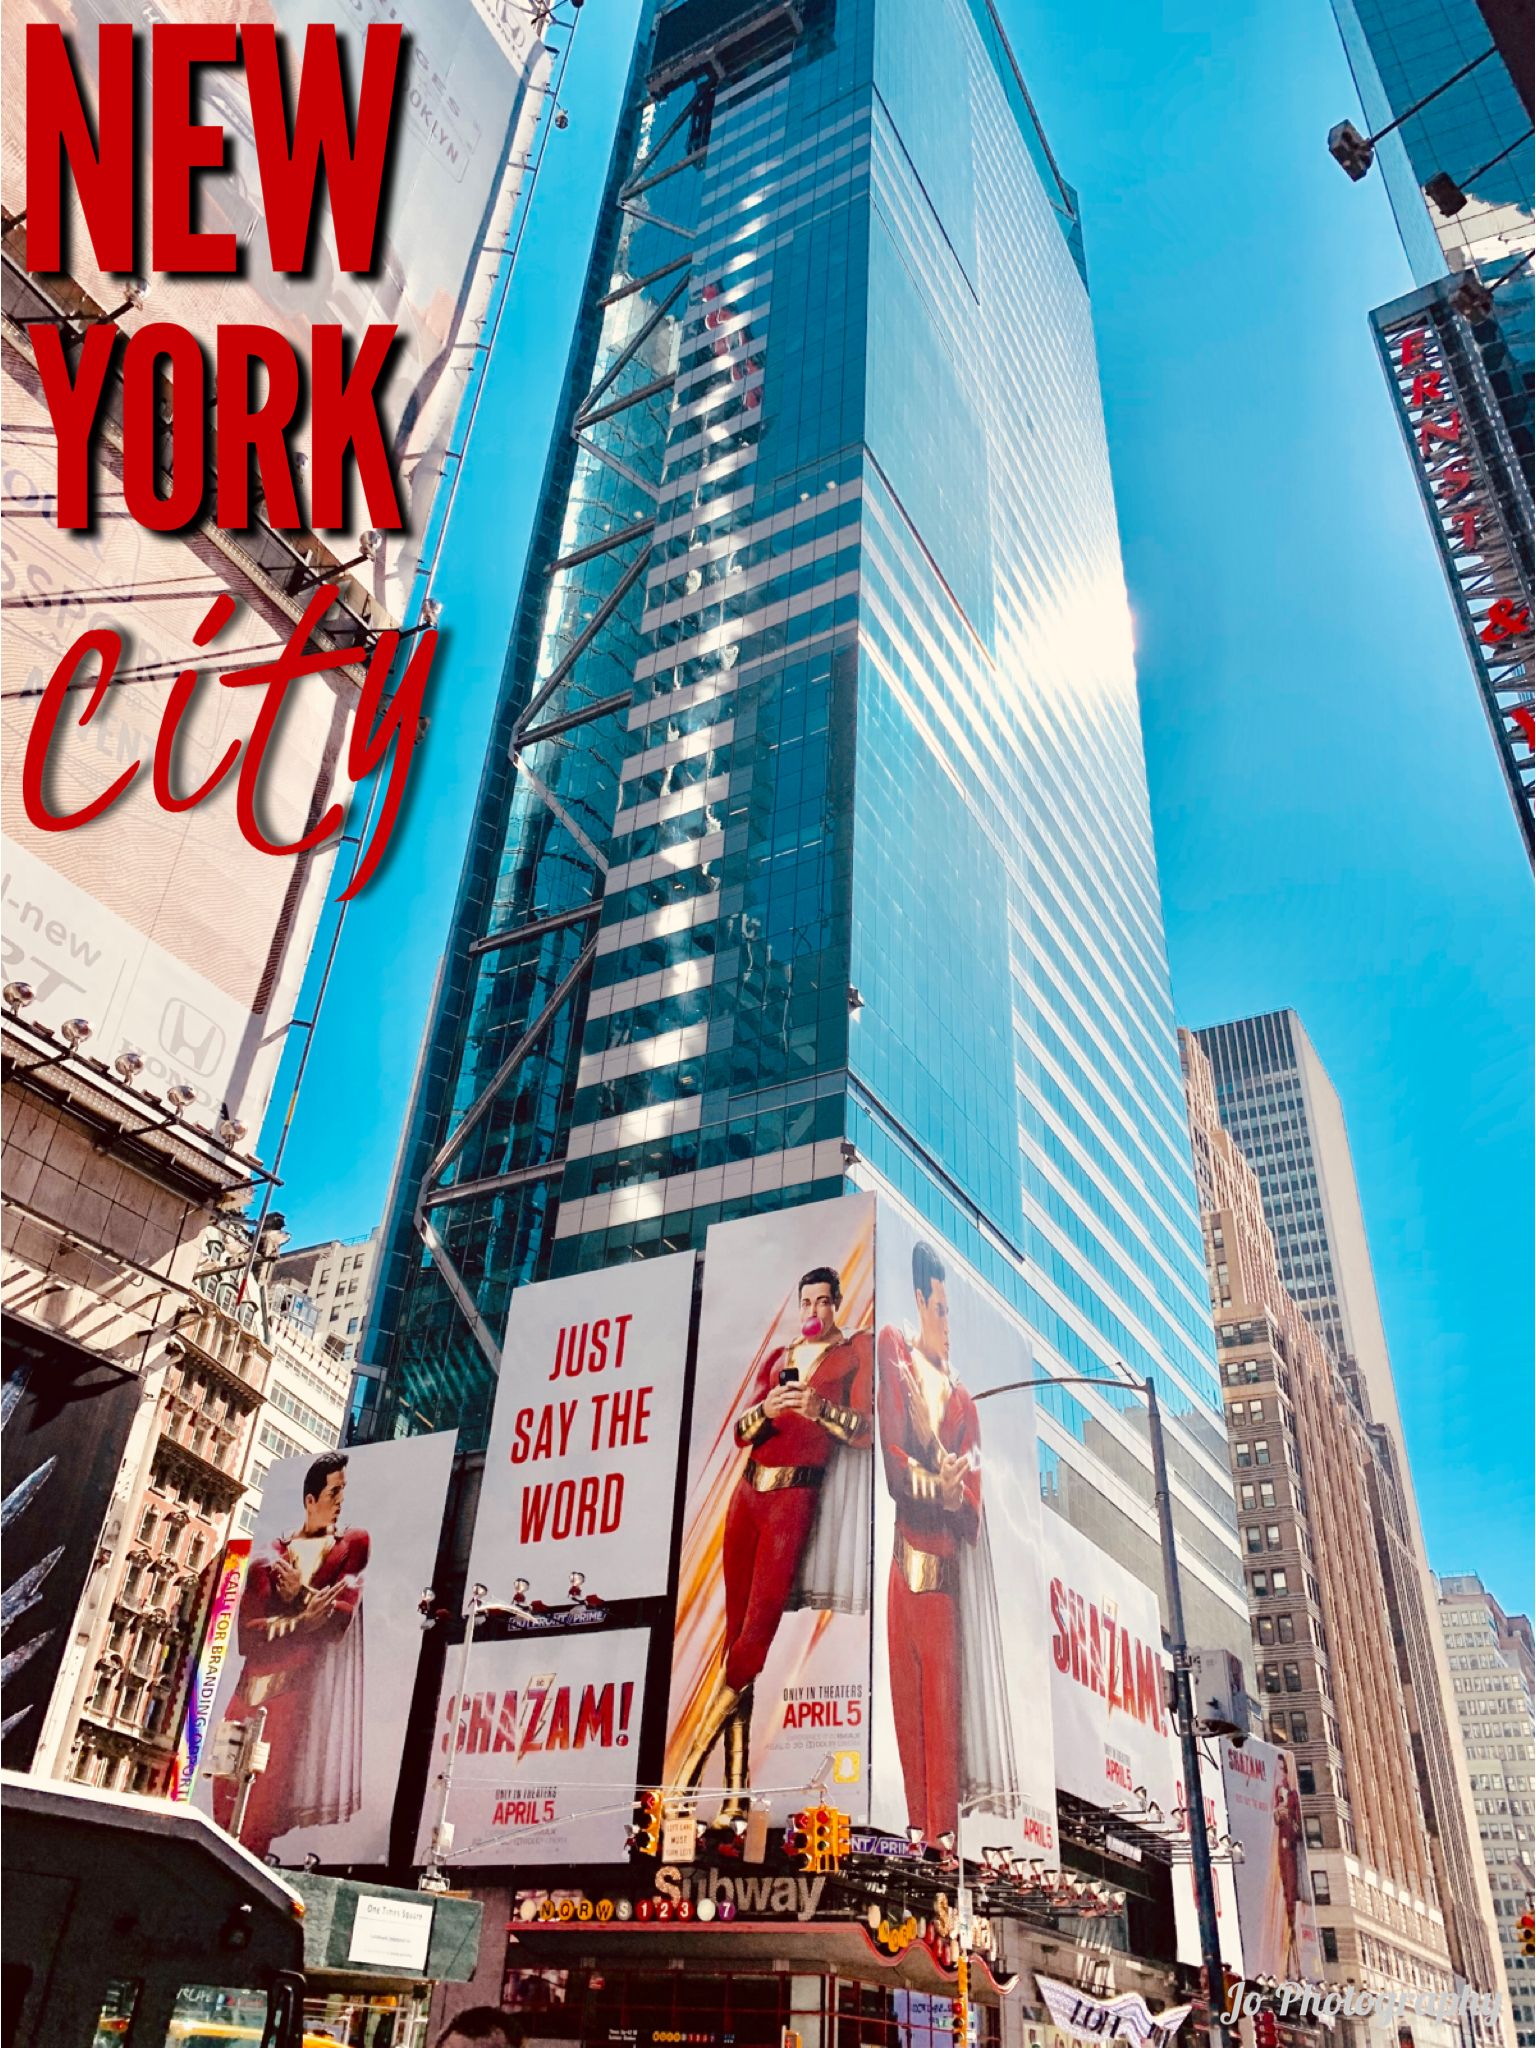 New York City Nyc New York City New York City